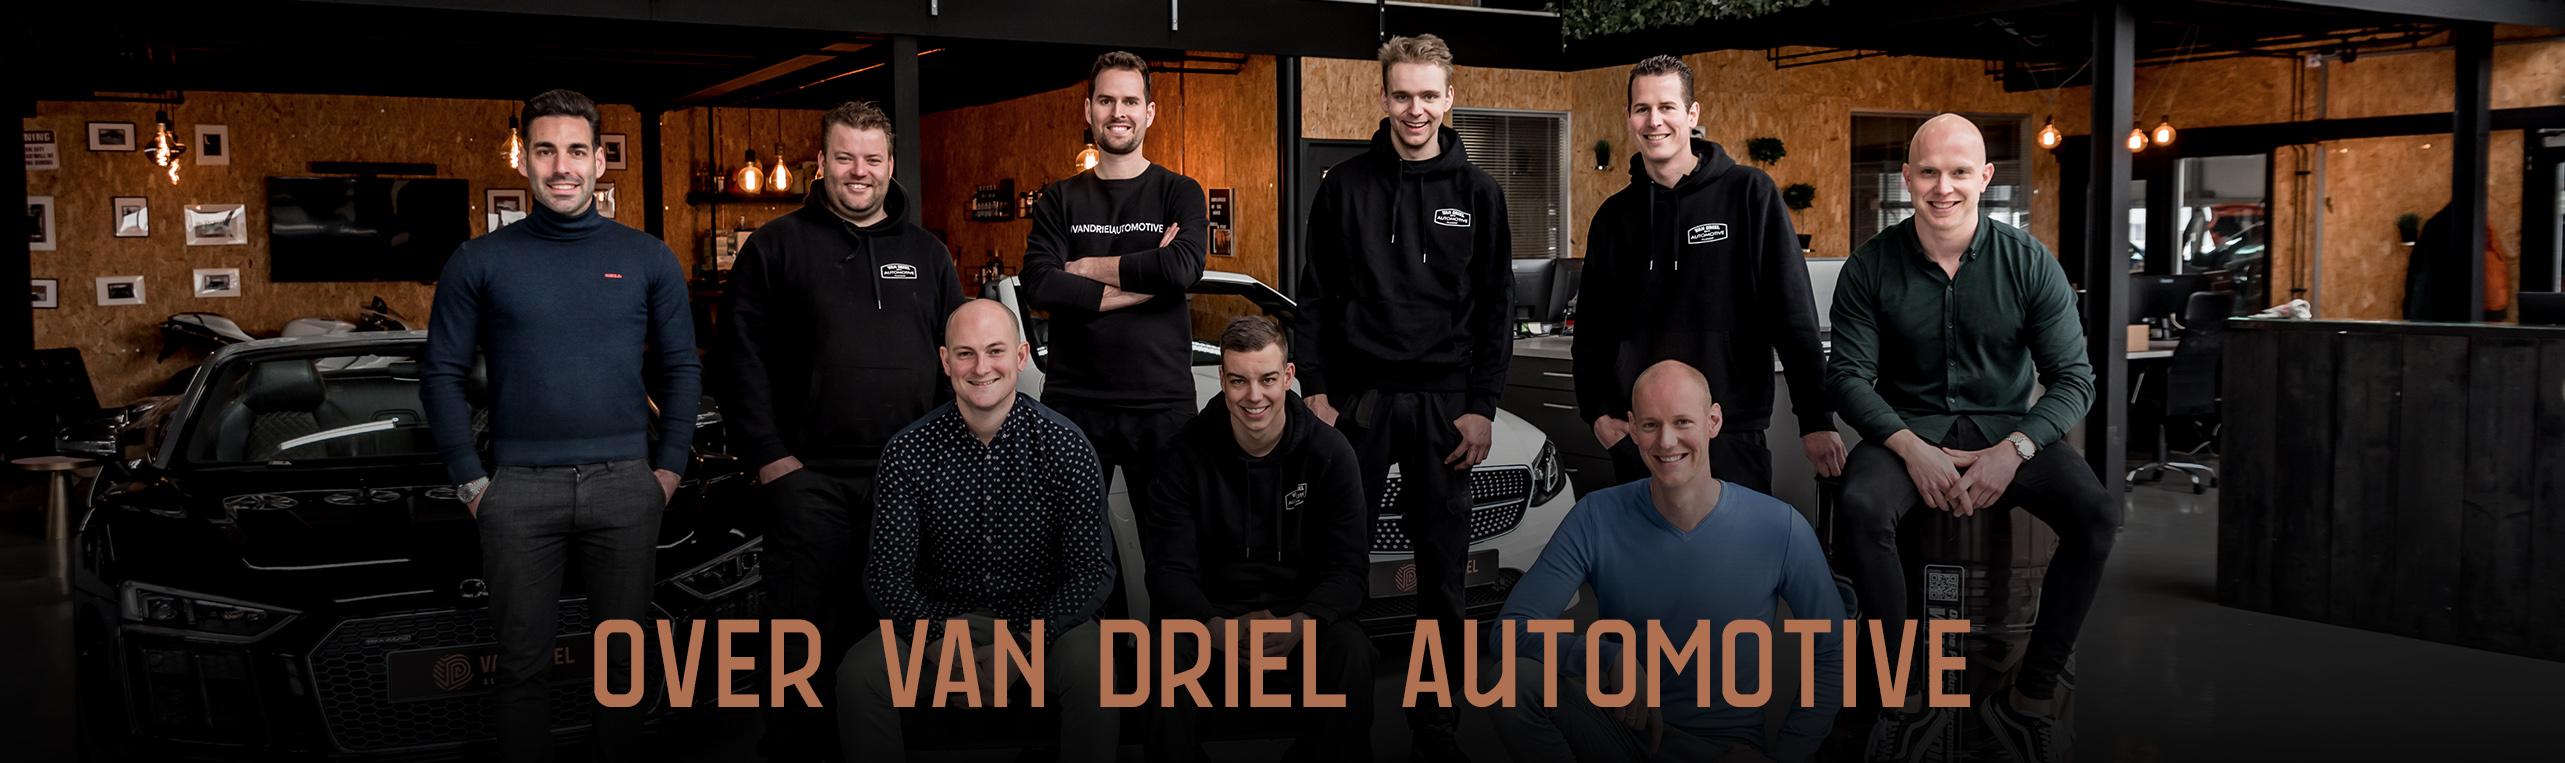 Over Van Driel Automotive